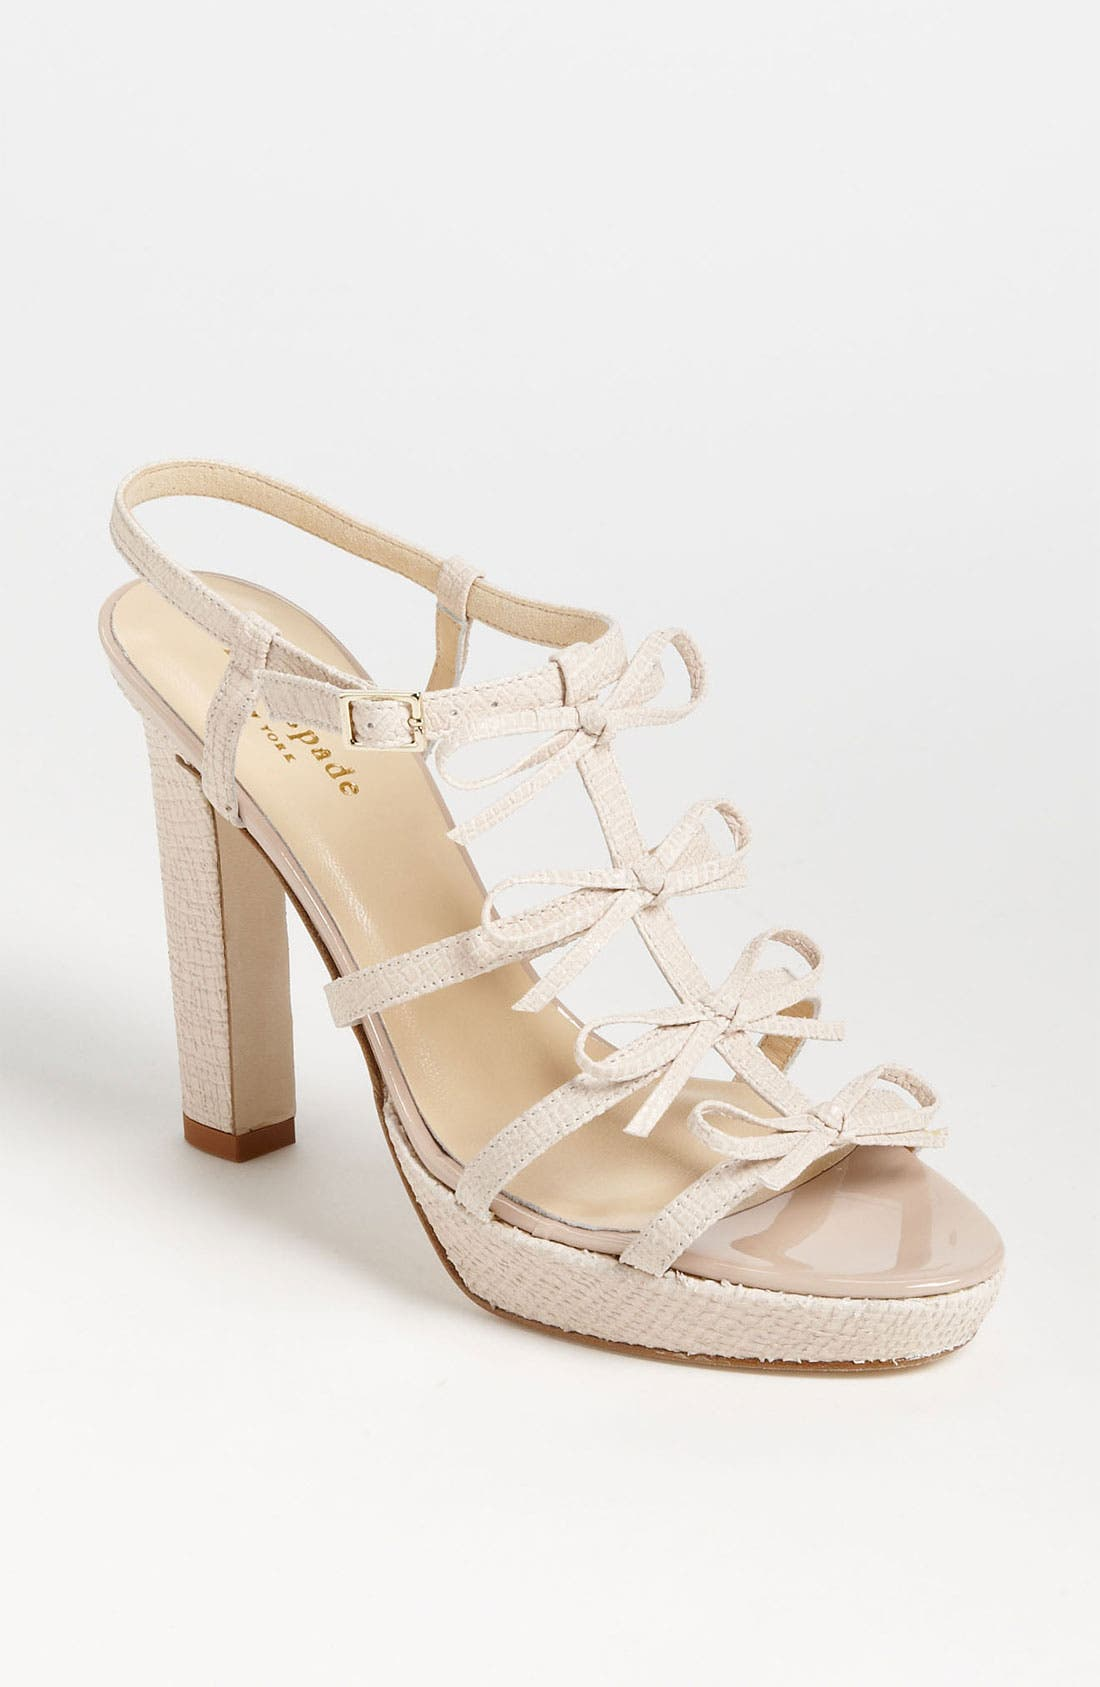 Main Image - kate spade new york 'baylyn' sandal